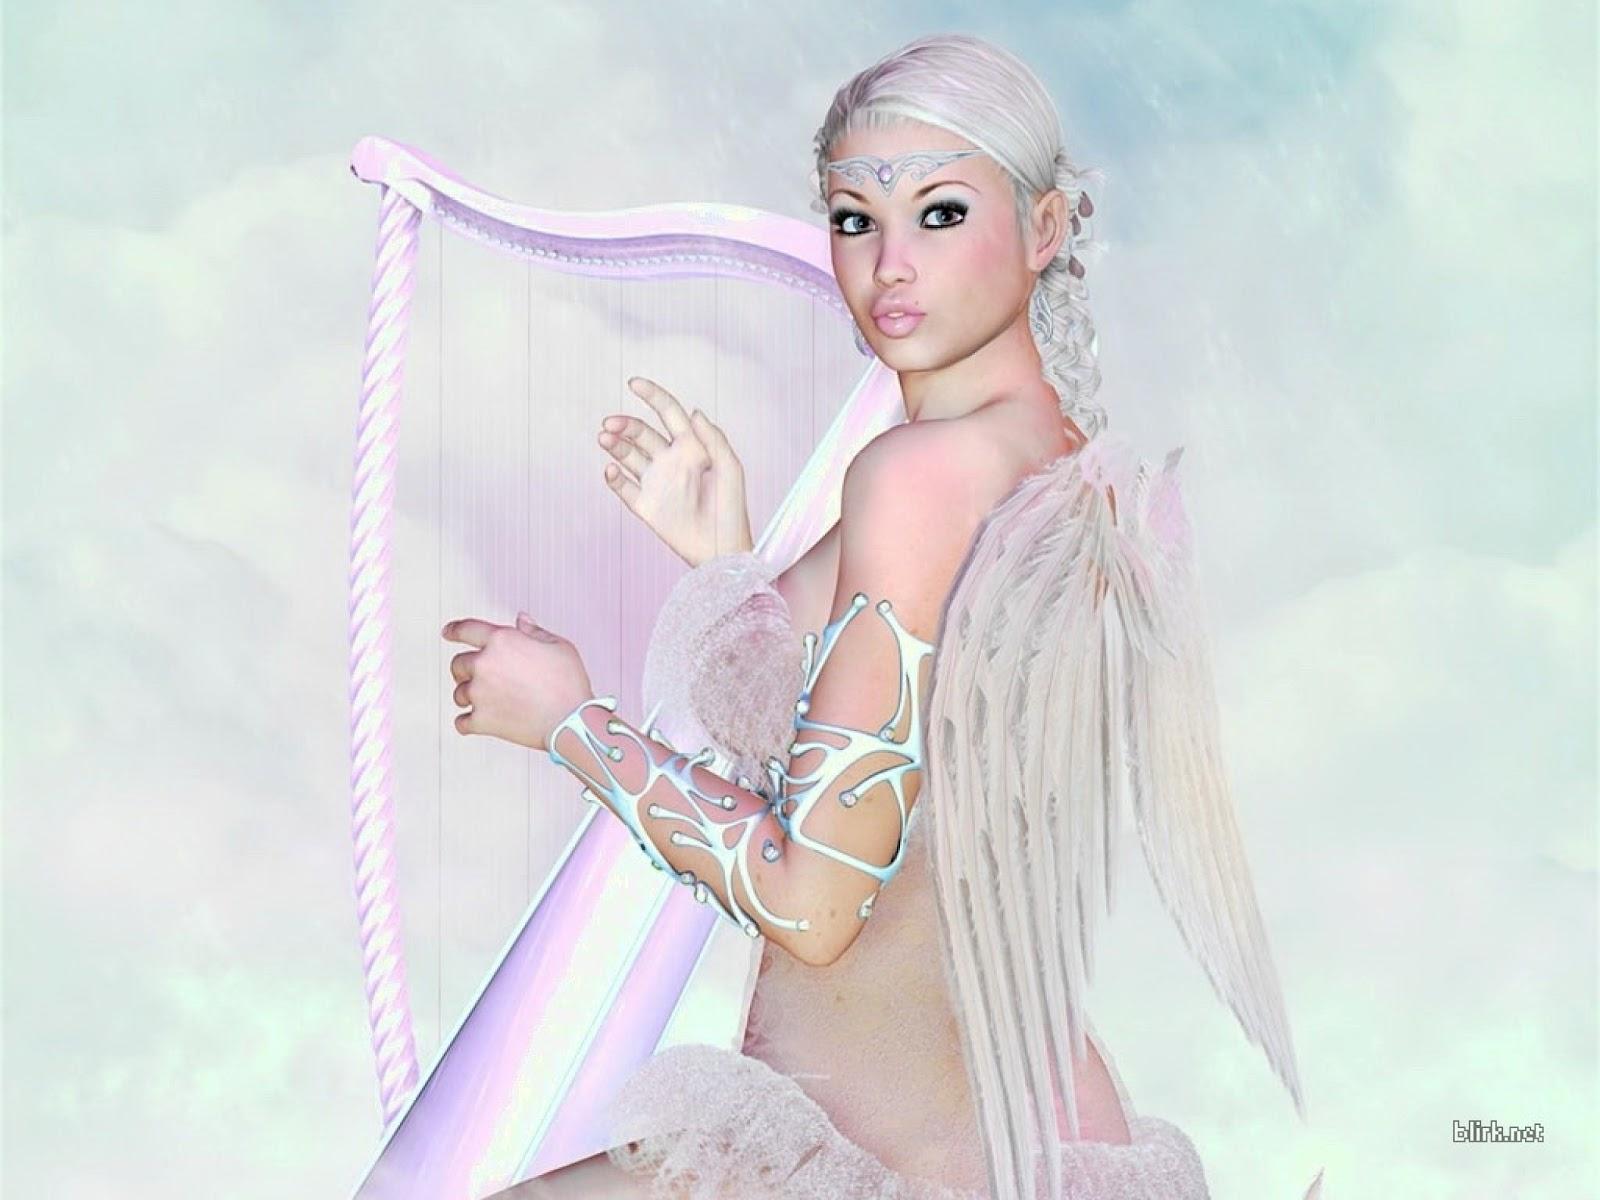 http://1.bp.blogspot.com/-INmZG8if7kU/T7FOiSjbvjI/AAAAAAAAADI/RKkGm99Pdrg/s1600/Angel_fantasy_White_Angel_Wallpaper_2560x1920_girl-3d-namkna-blogspot-com.jpg